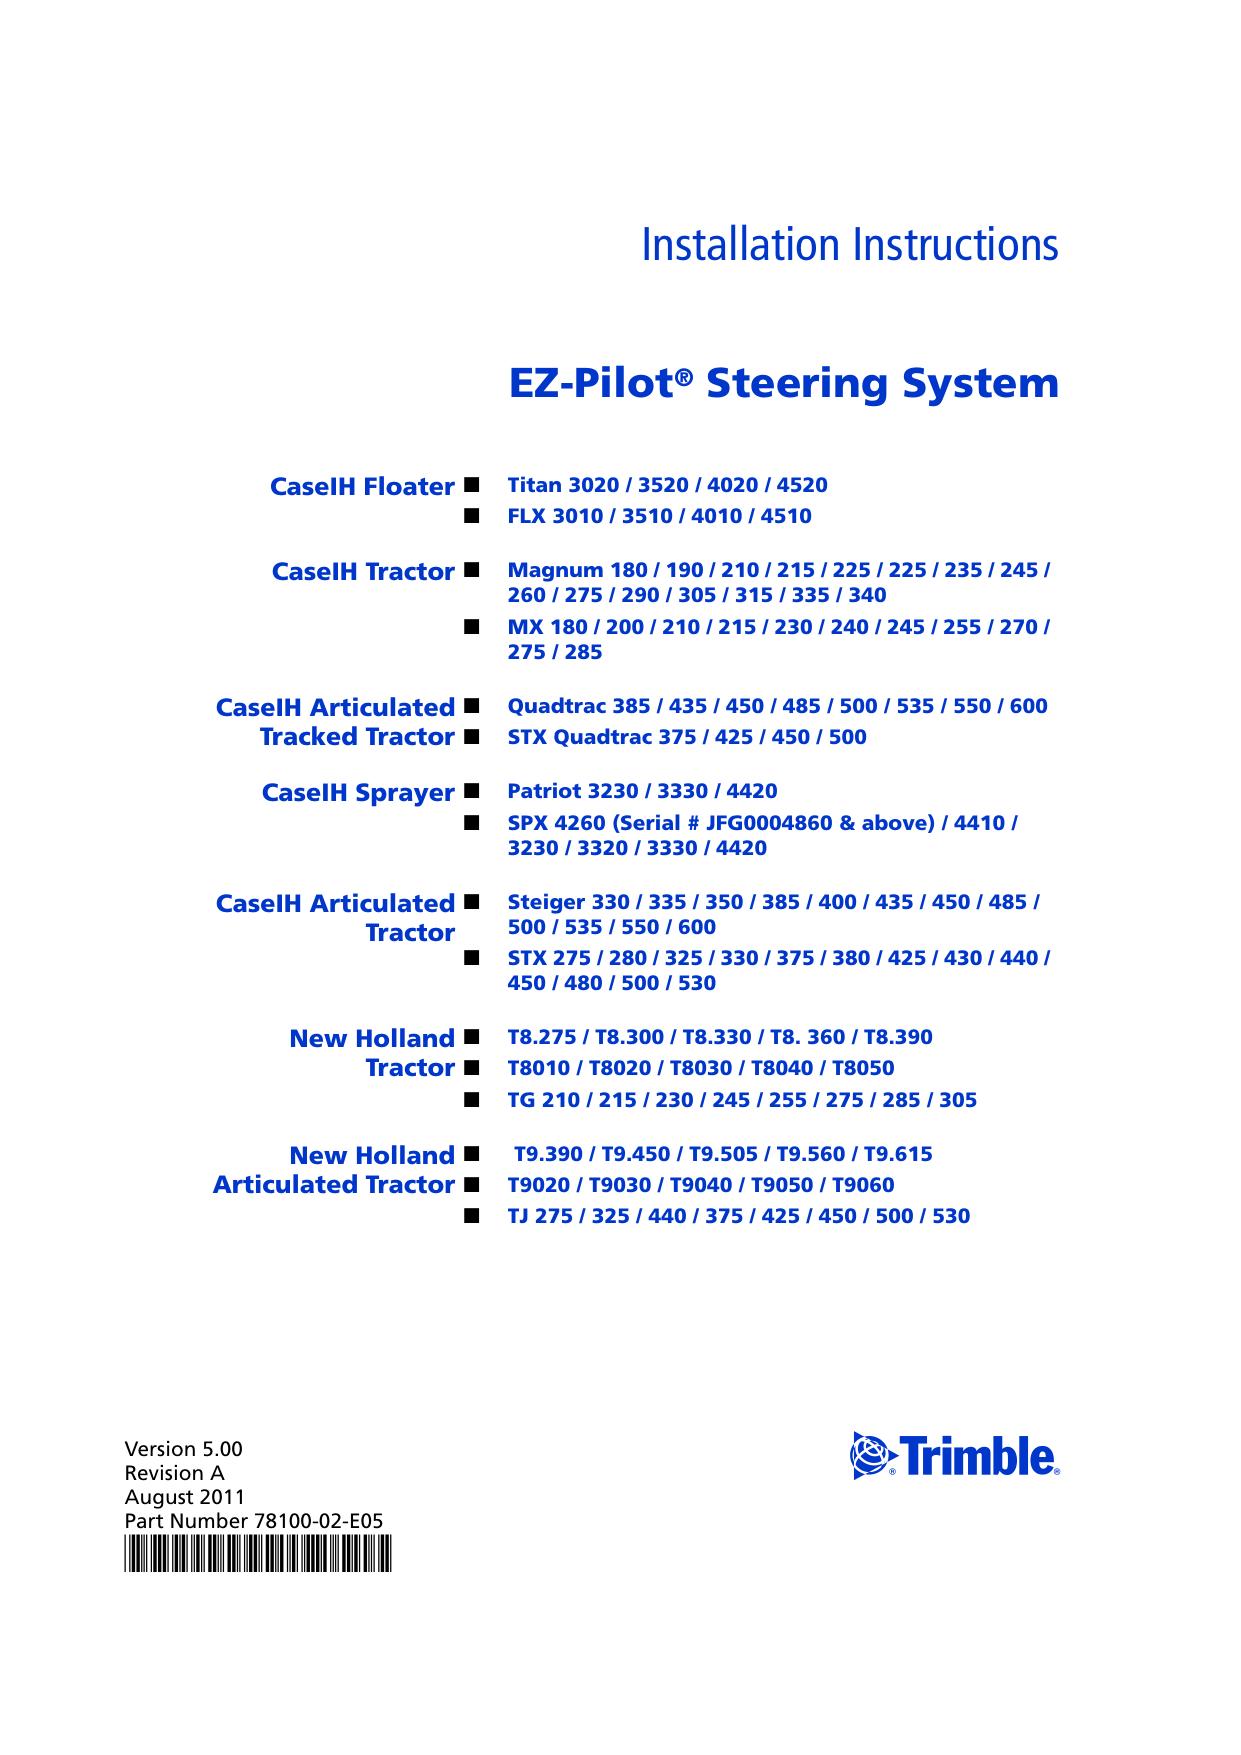 EZ-Pilot Steering System Installation Instructions